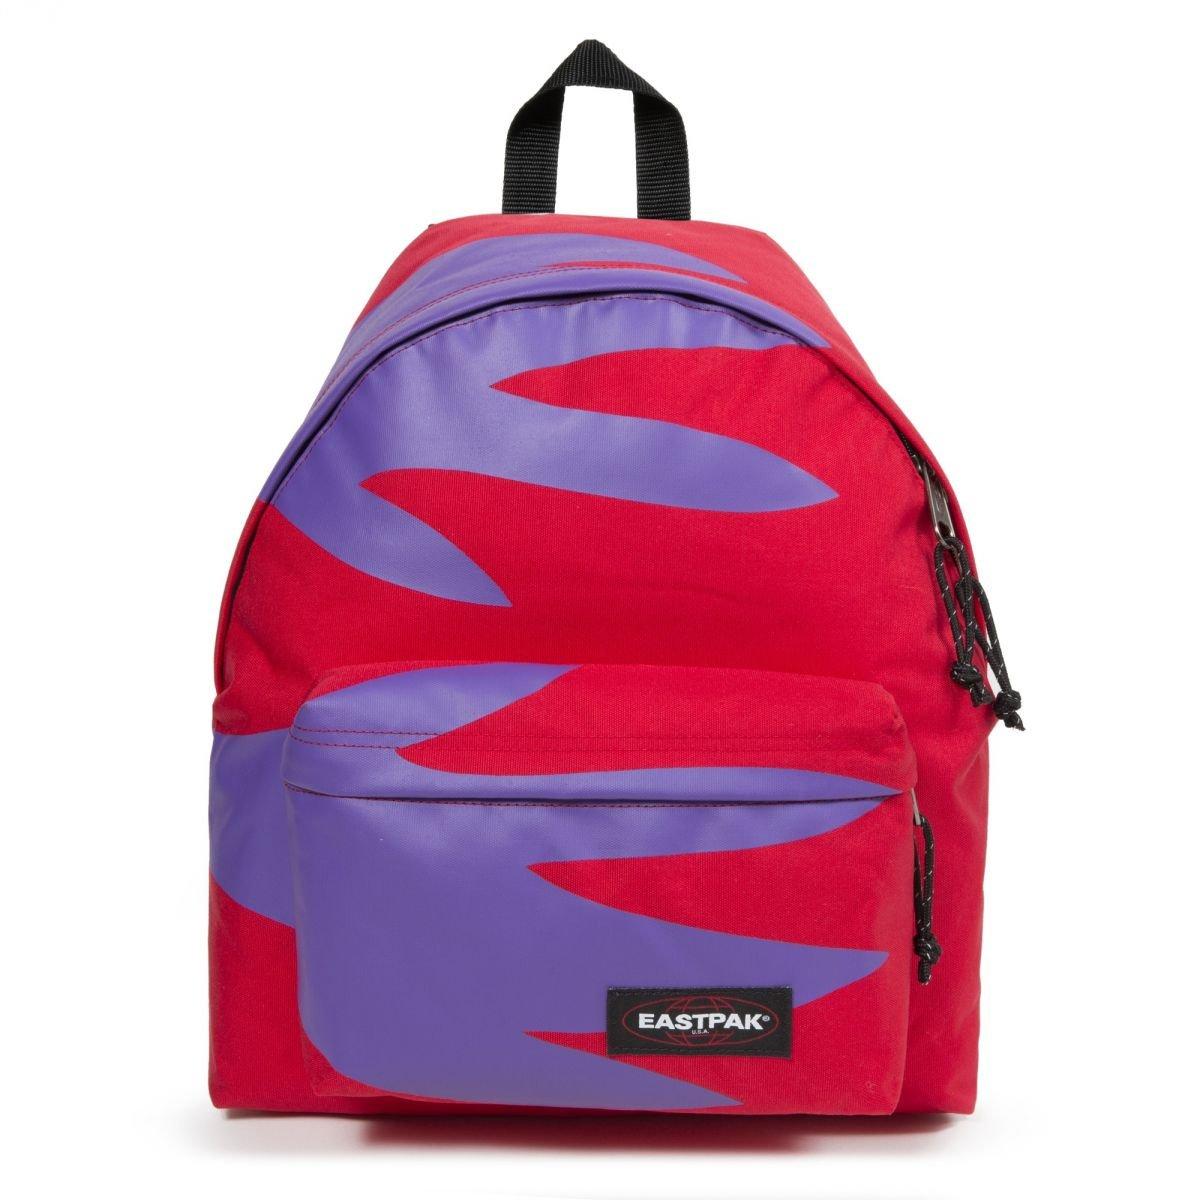 Eastpack Padded Pak'r Rucksack, Rucksack, Rucksack, 40 cm, Schwarz (Streak) B01HH1POPK Daypacks Räumungsverkauf 8f0096